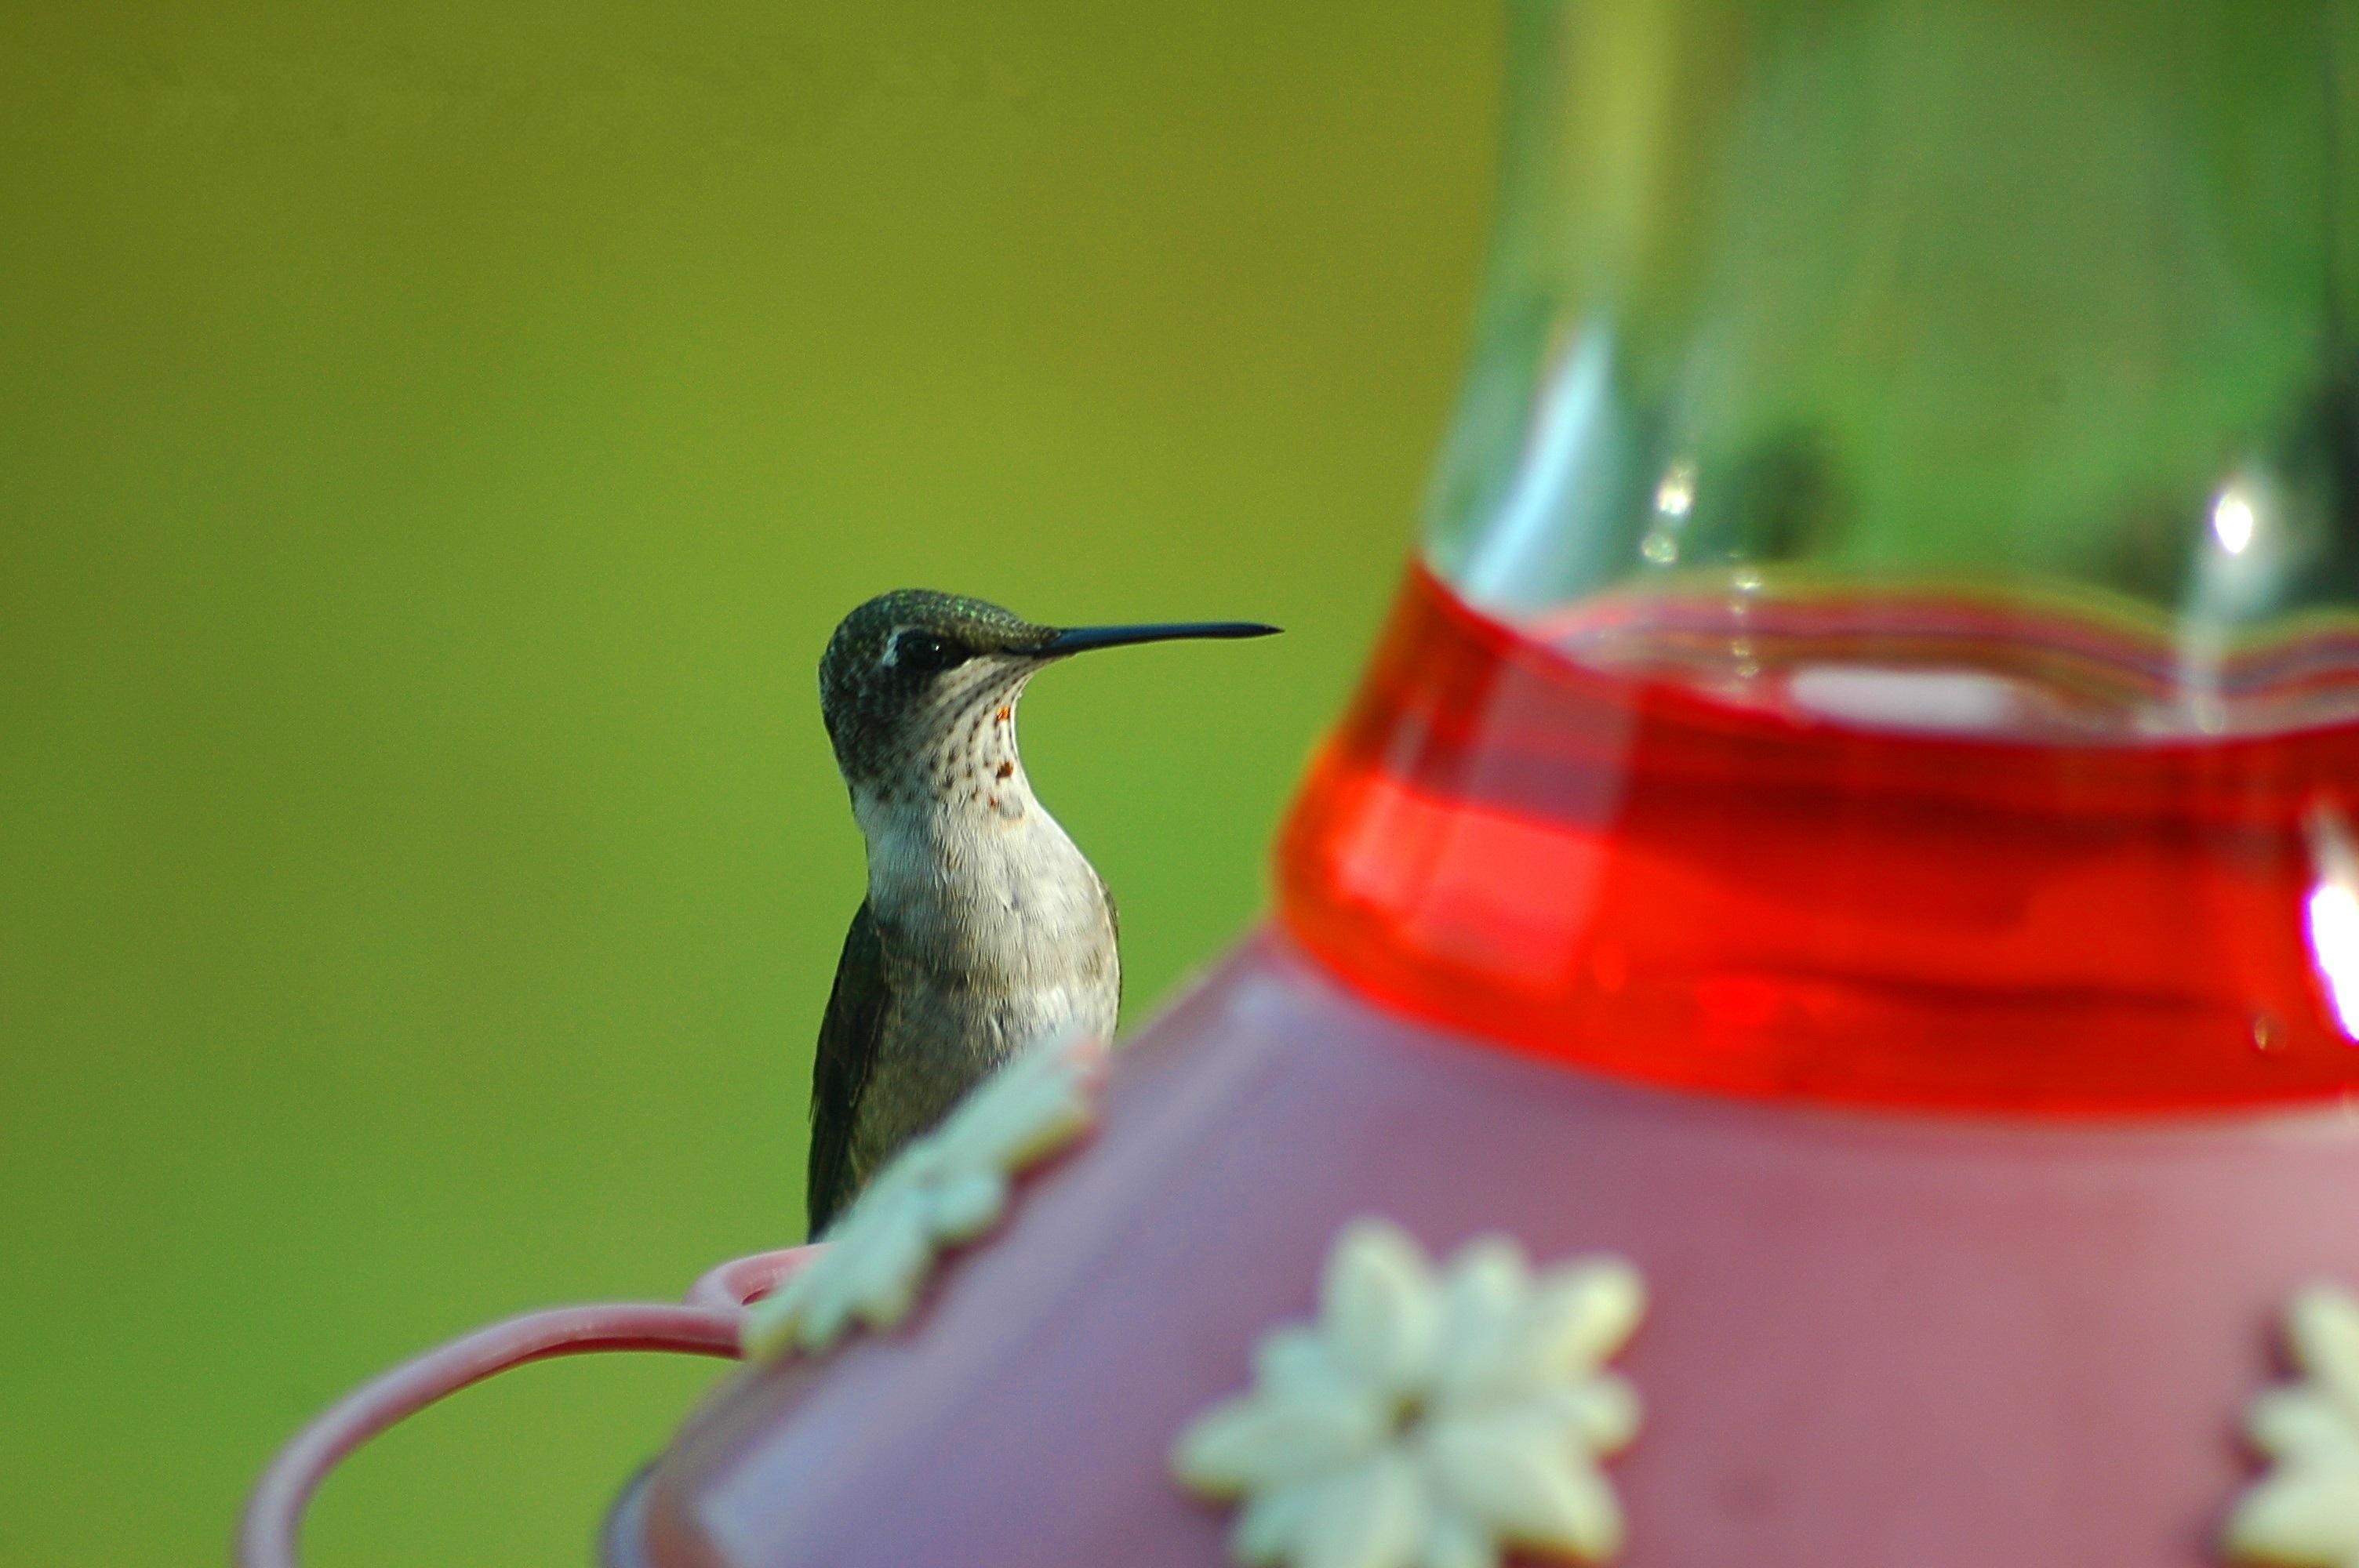 Rubin torkú kolibri